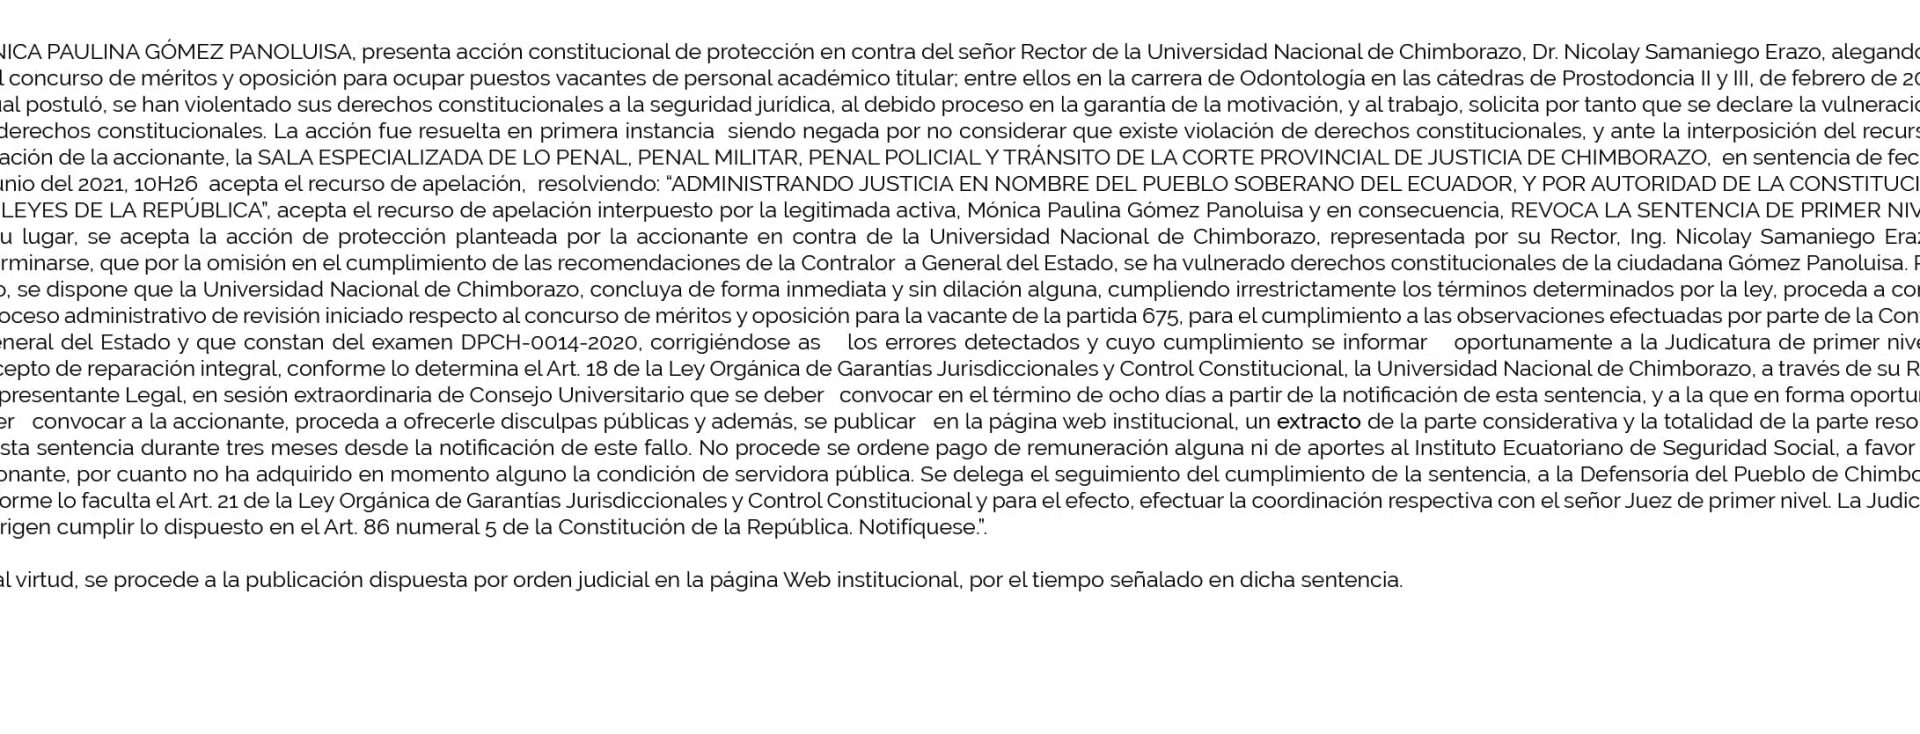 PUBLICACIÓN DE SENTENCIA